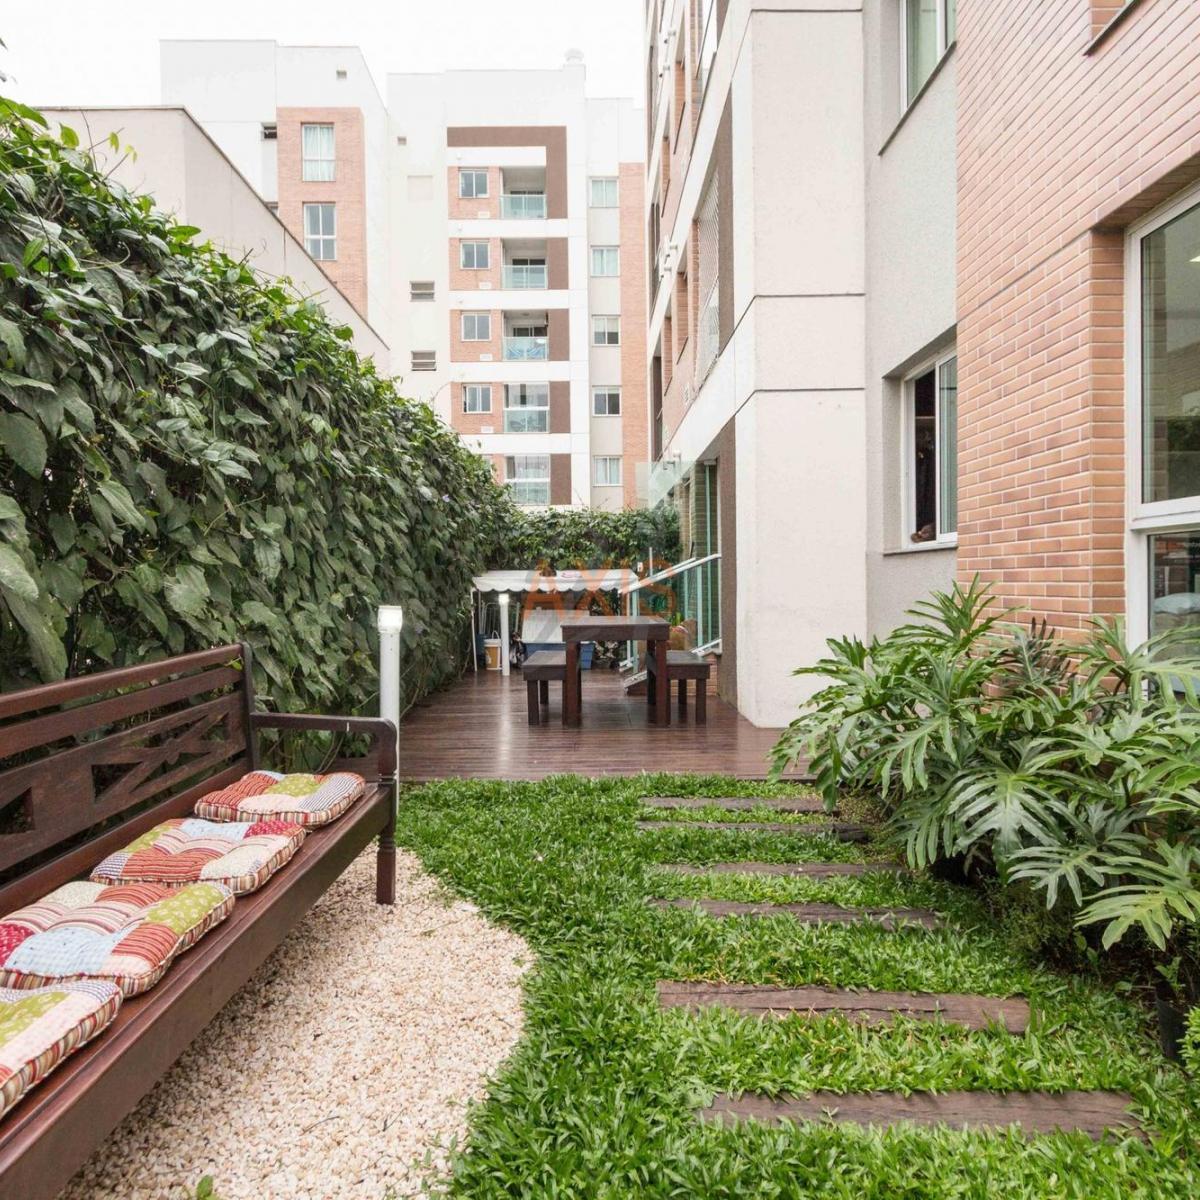 http://www.infocenterhost2.com.br/crm/fotosimovel/360566/96763670-apartamento-curitiba-ecoville_marcadagua.jpg